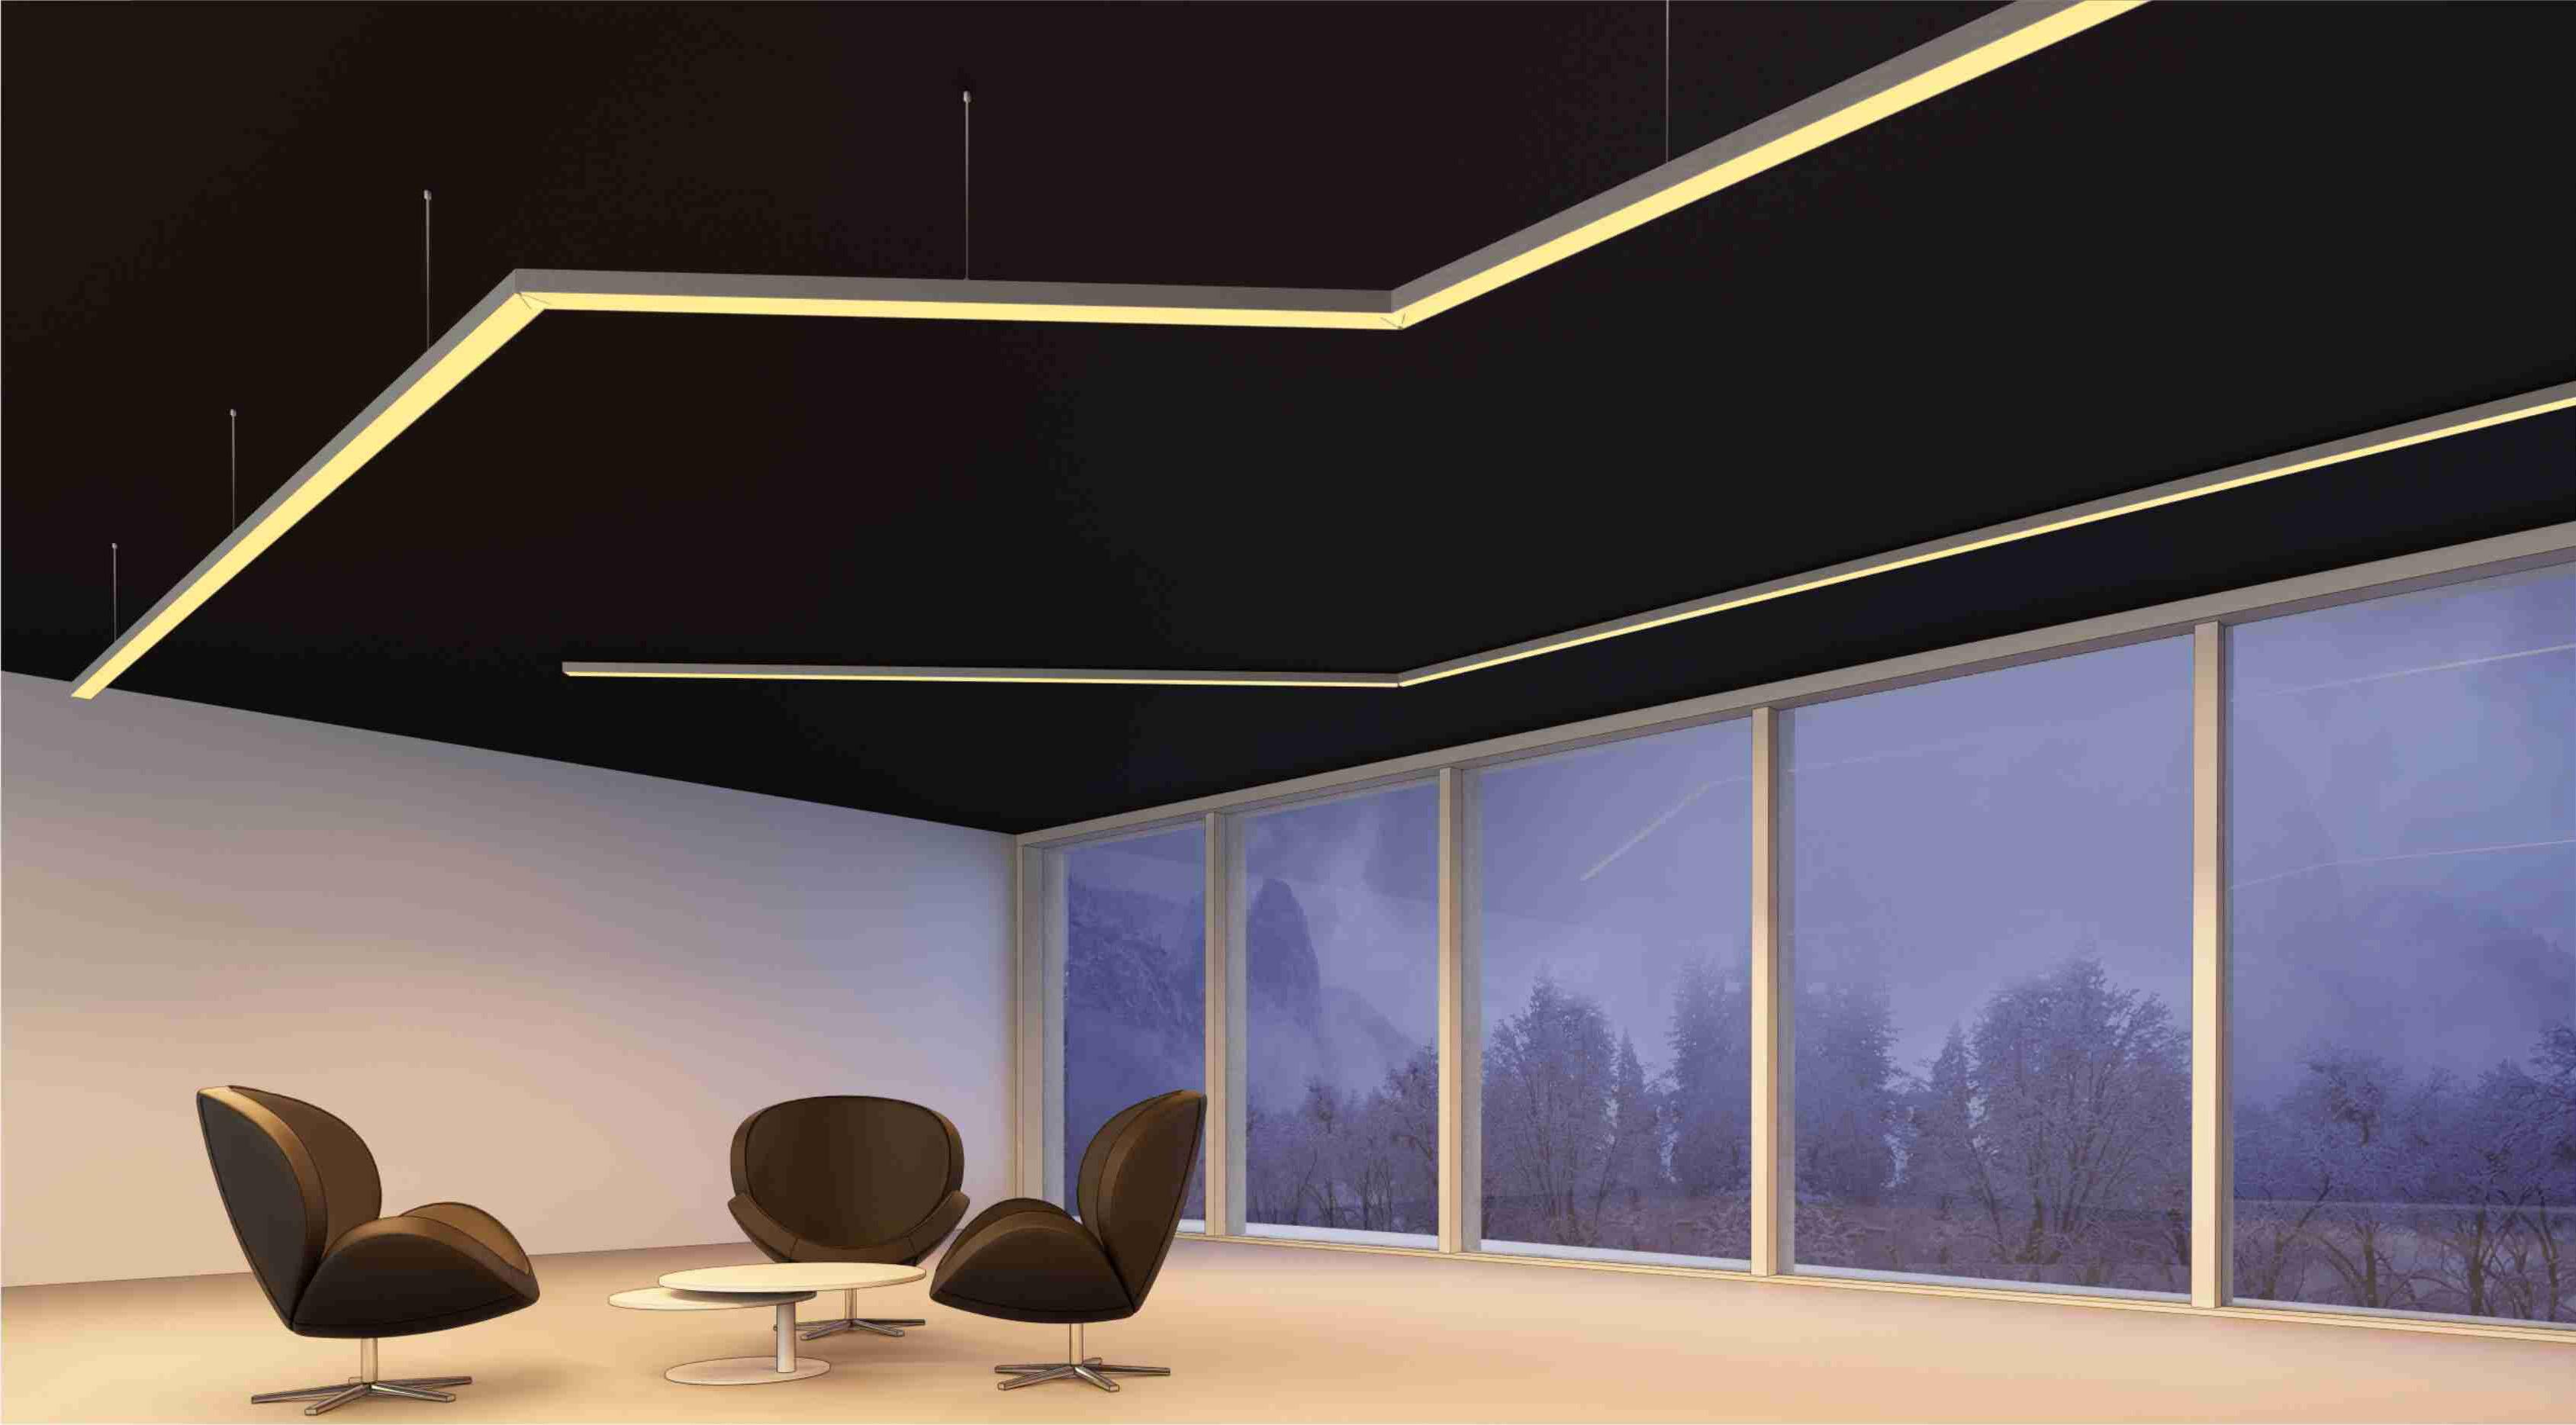 Iluminaci n de sala con perfiles suspendidos y tira de leds - Iluminacion tiras led ...